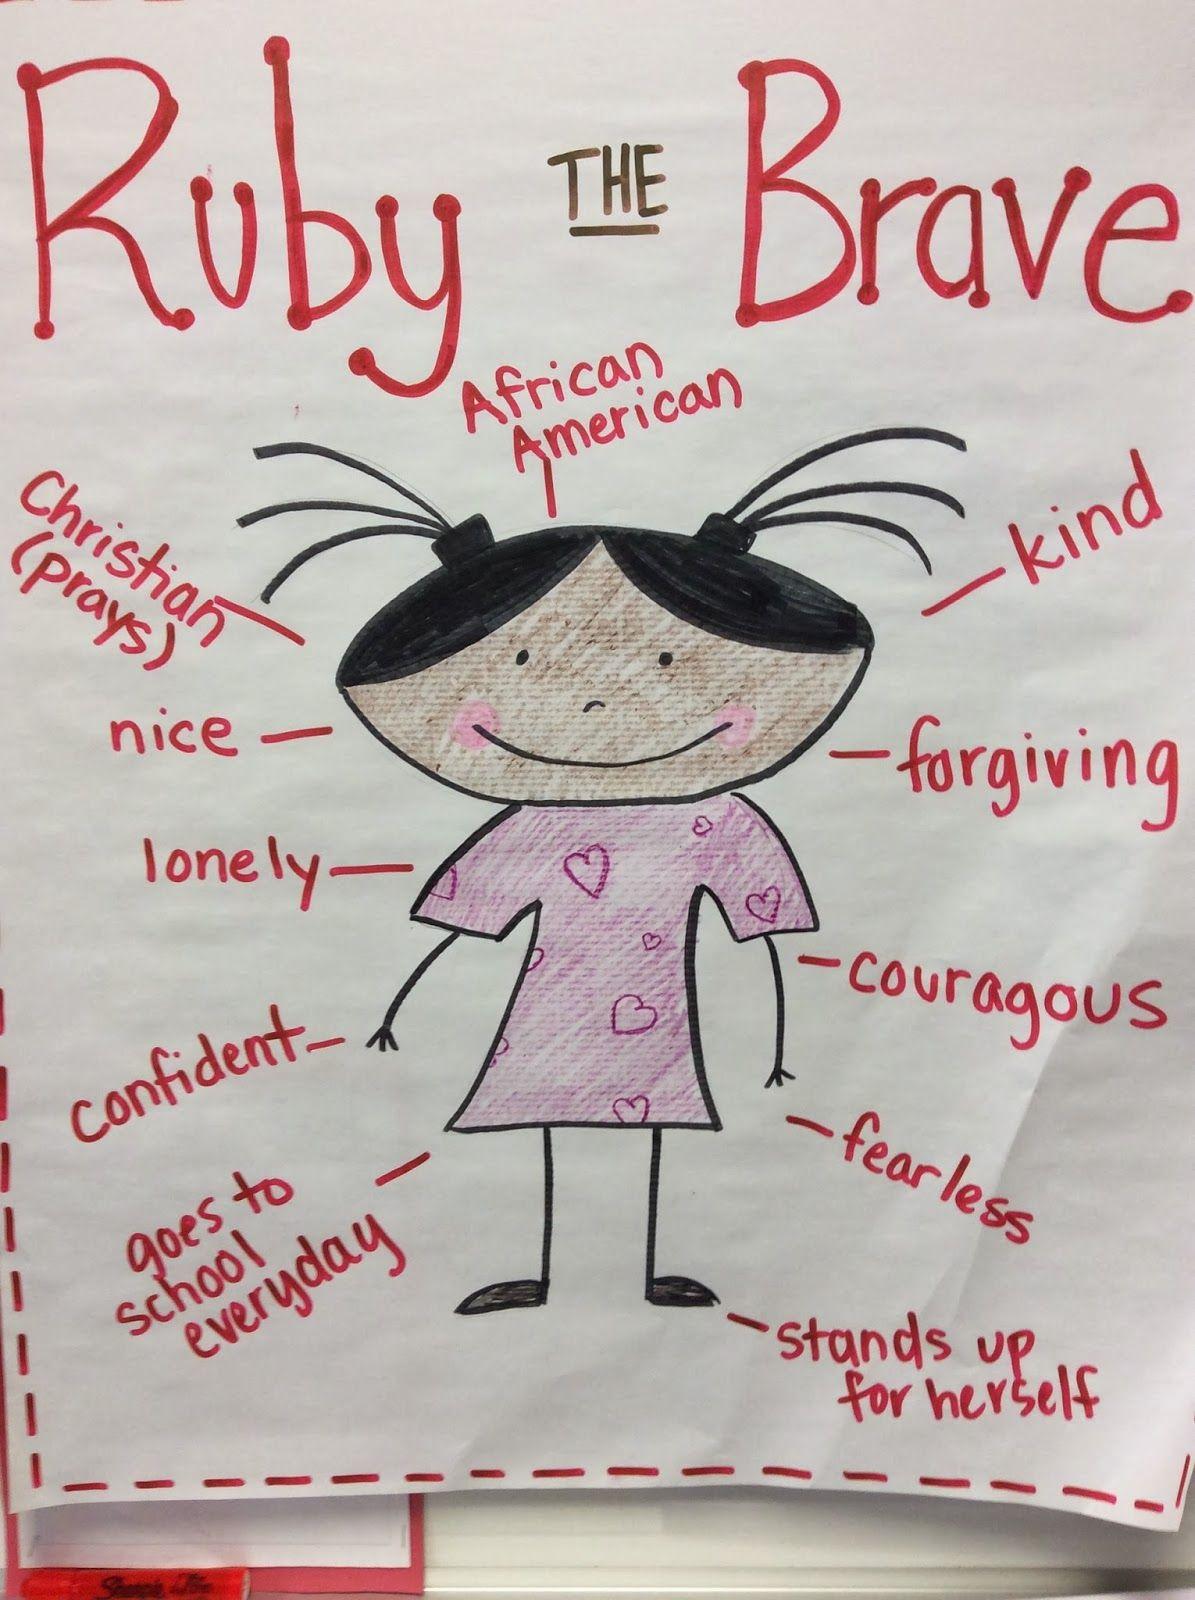 Brainstorming Ruby Bridge S Characteristics For Black